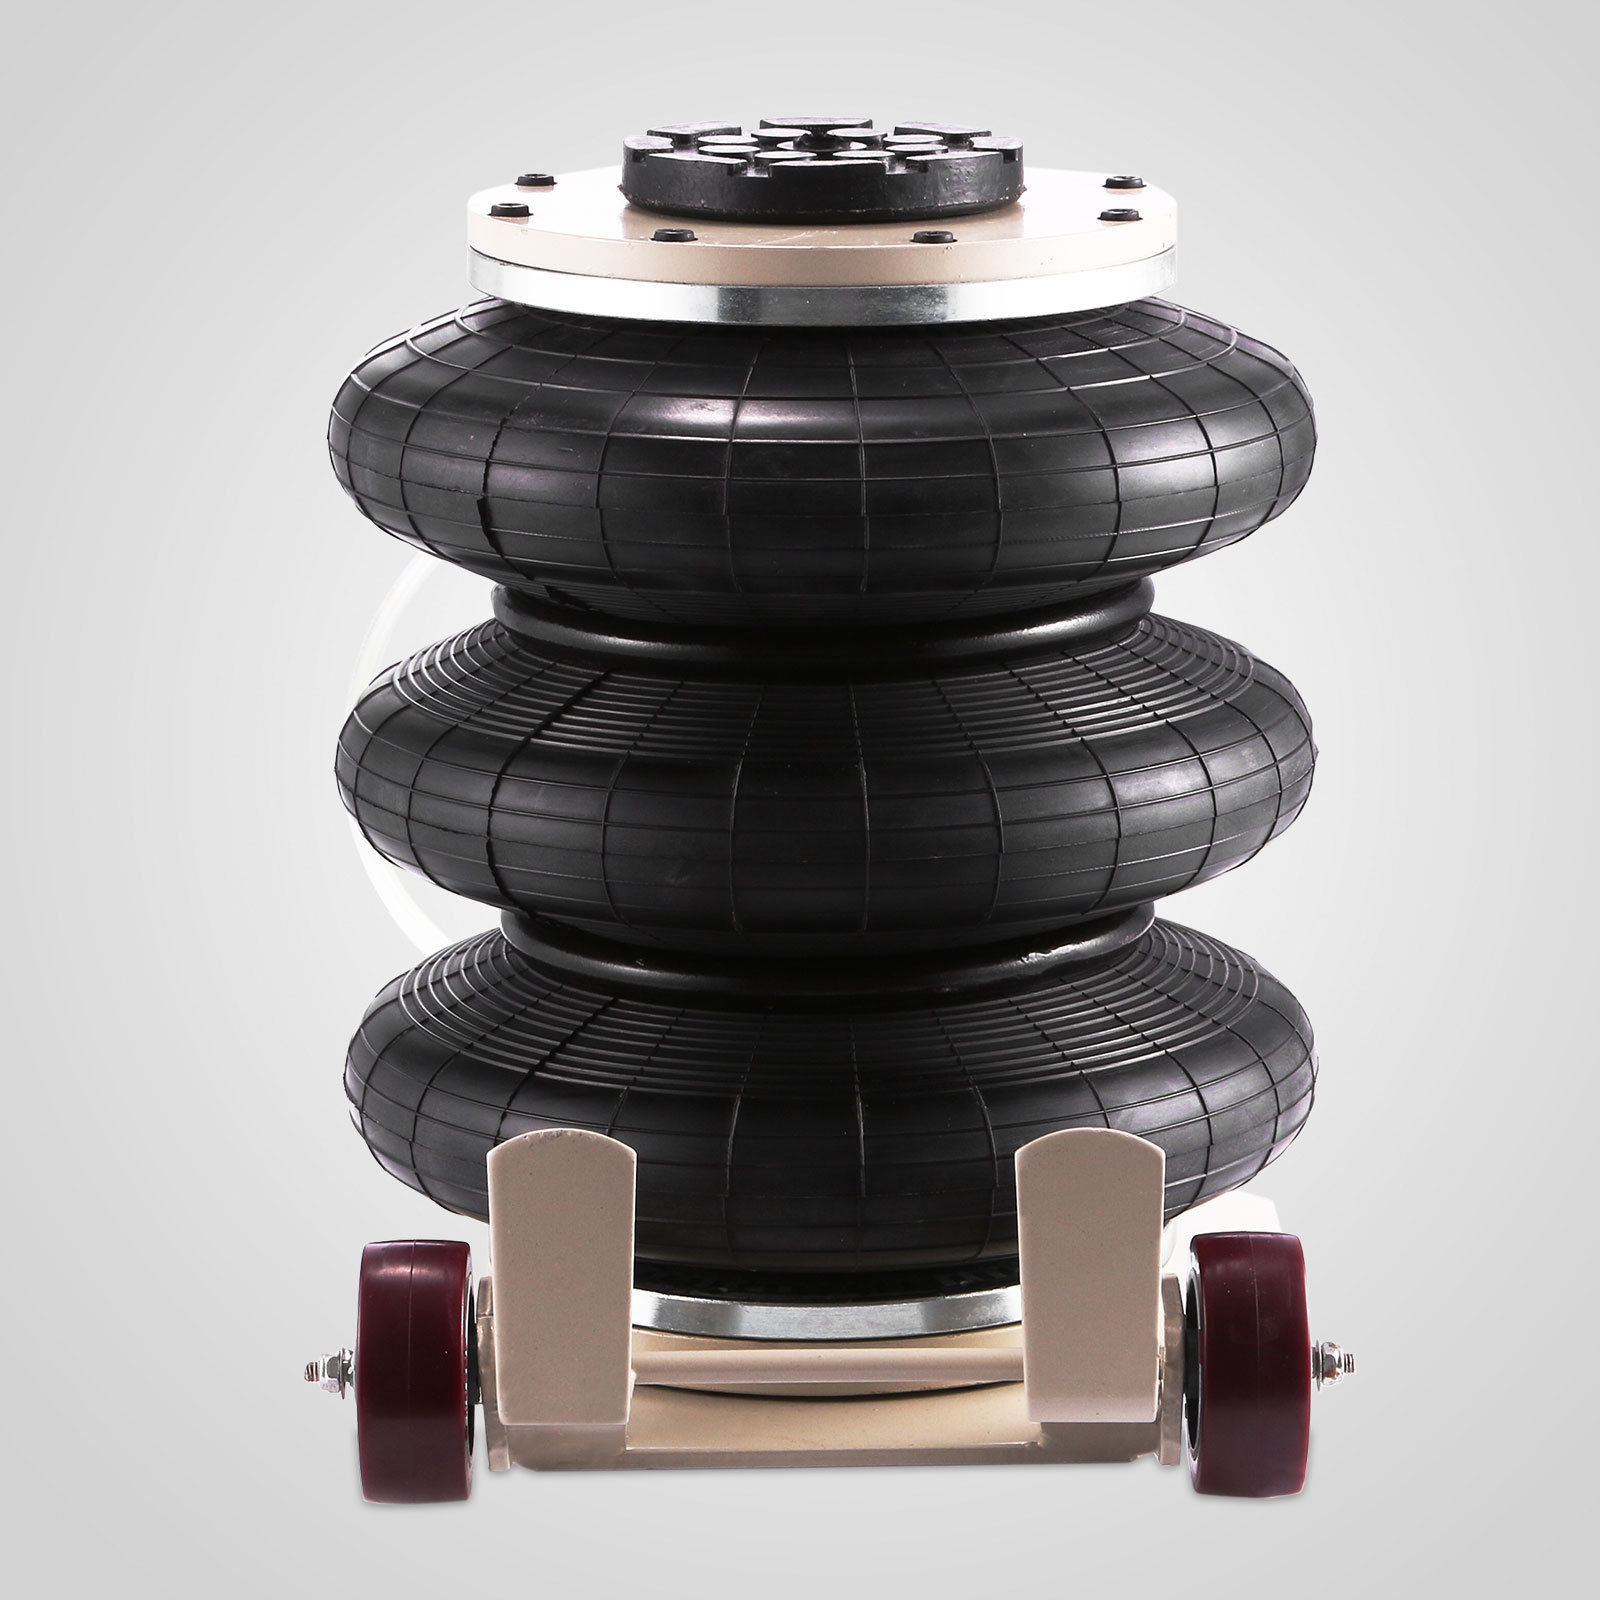 2 5t pneumatischer wagenheber rangierwagenheber wagen neu. Black Bedroom Furniture Sets. Home Design Ideas